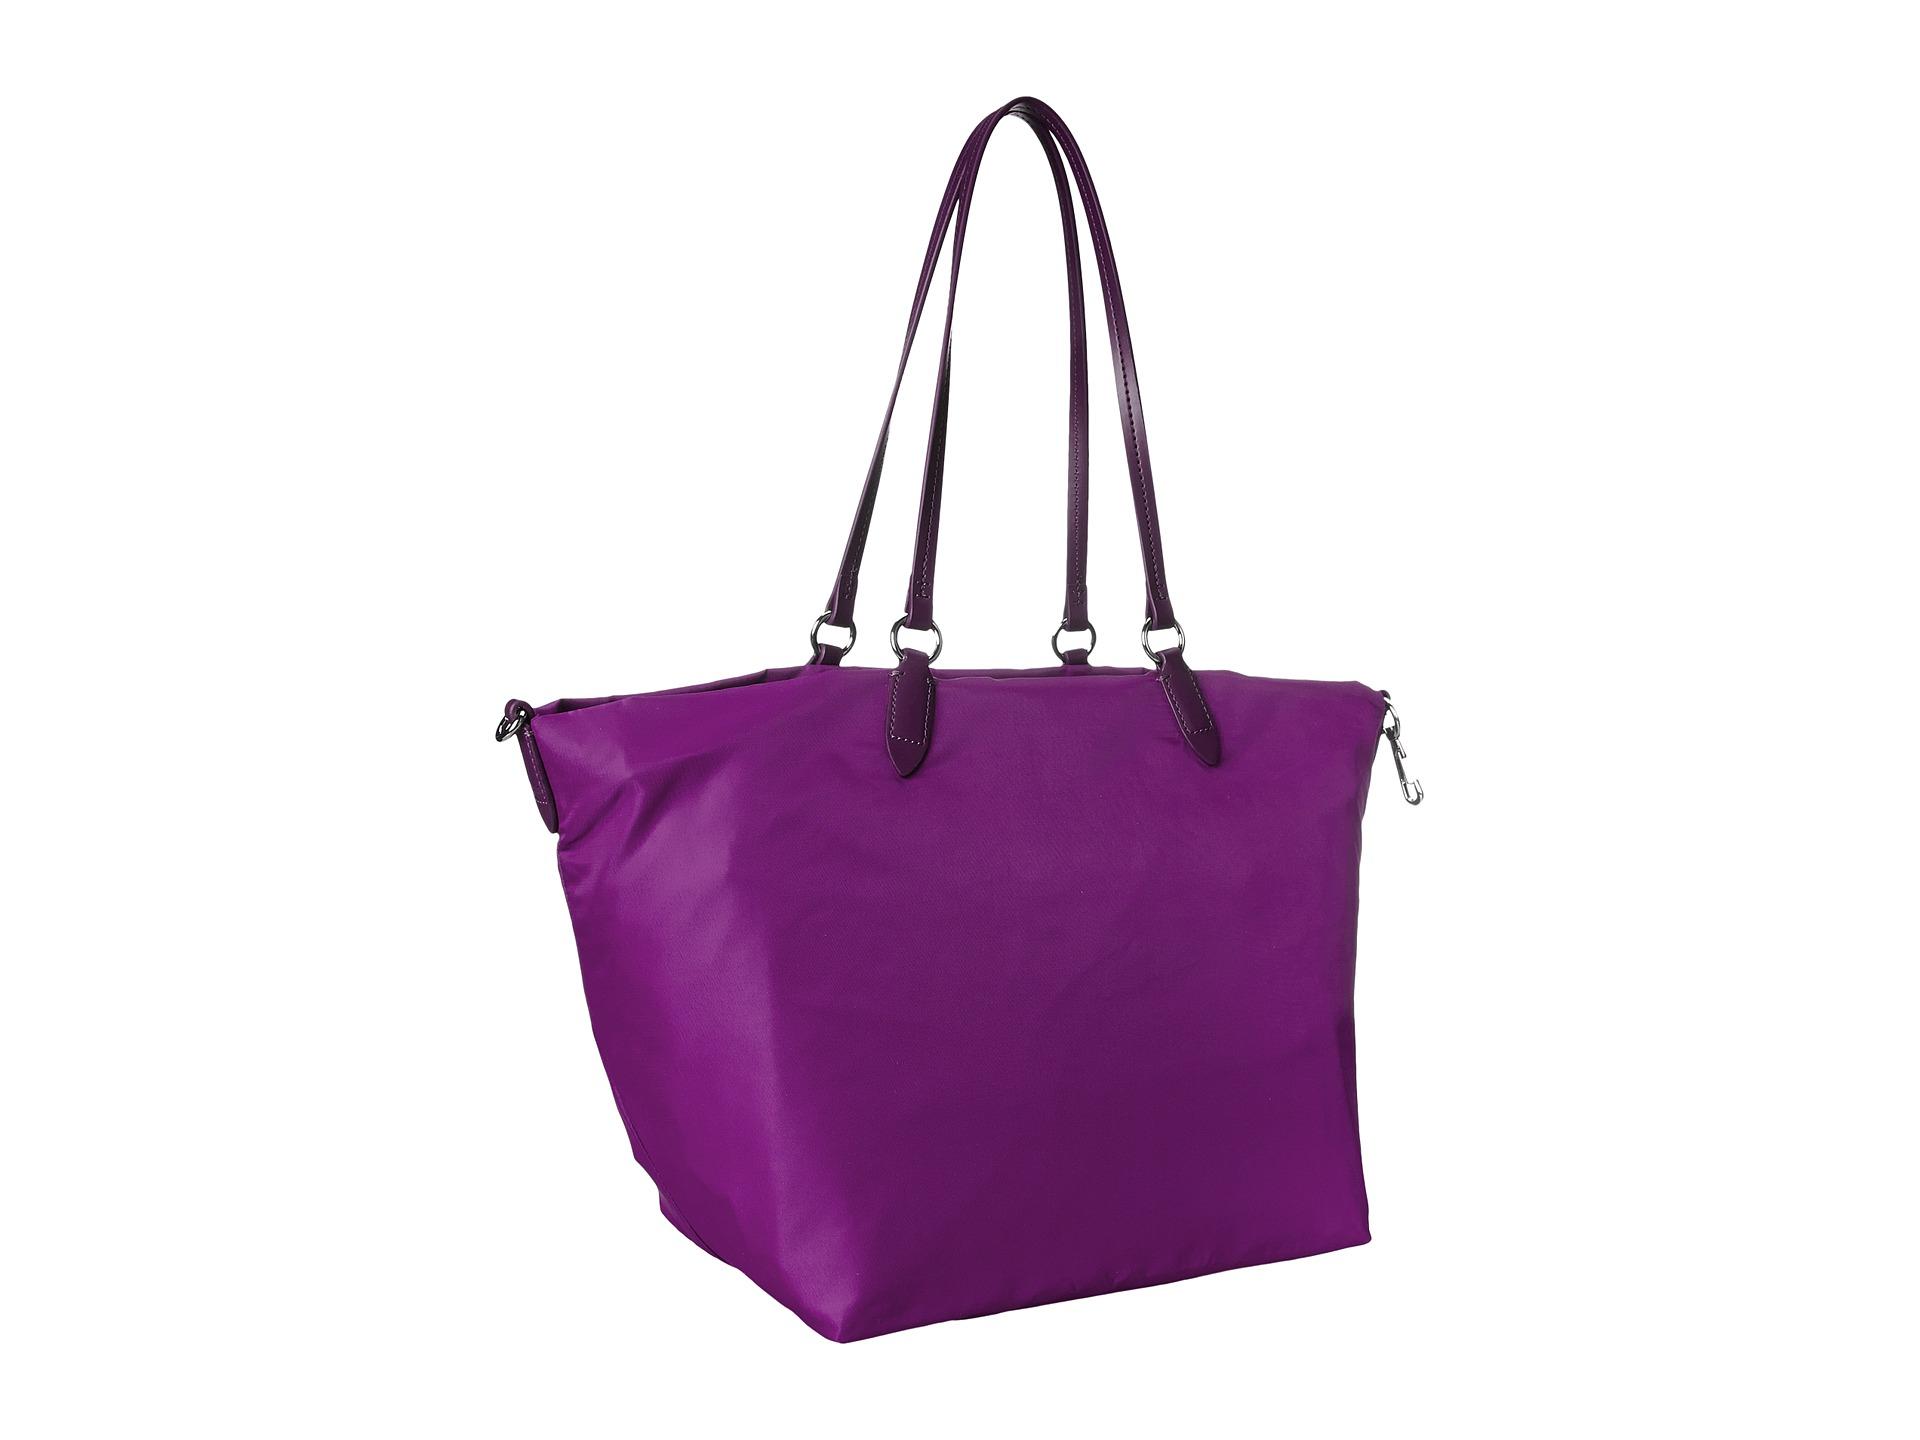 197819e90195c4 Lyst - Lacoste Izzie Medium Carry All Bag in Purple